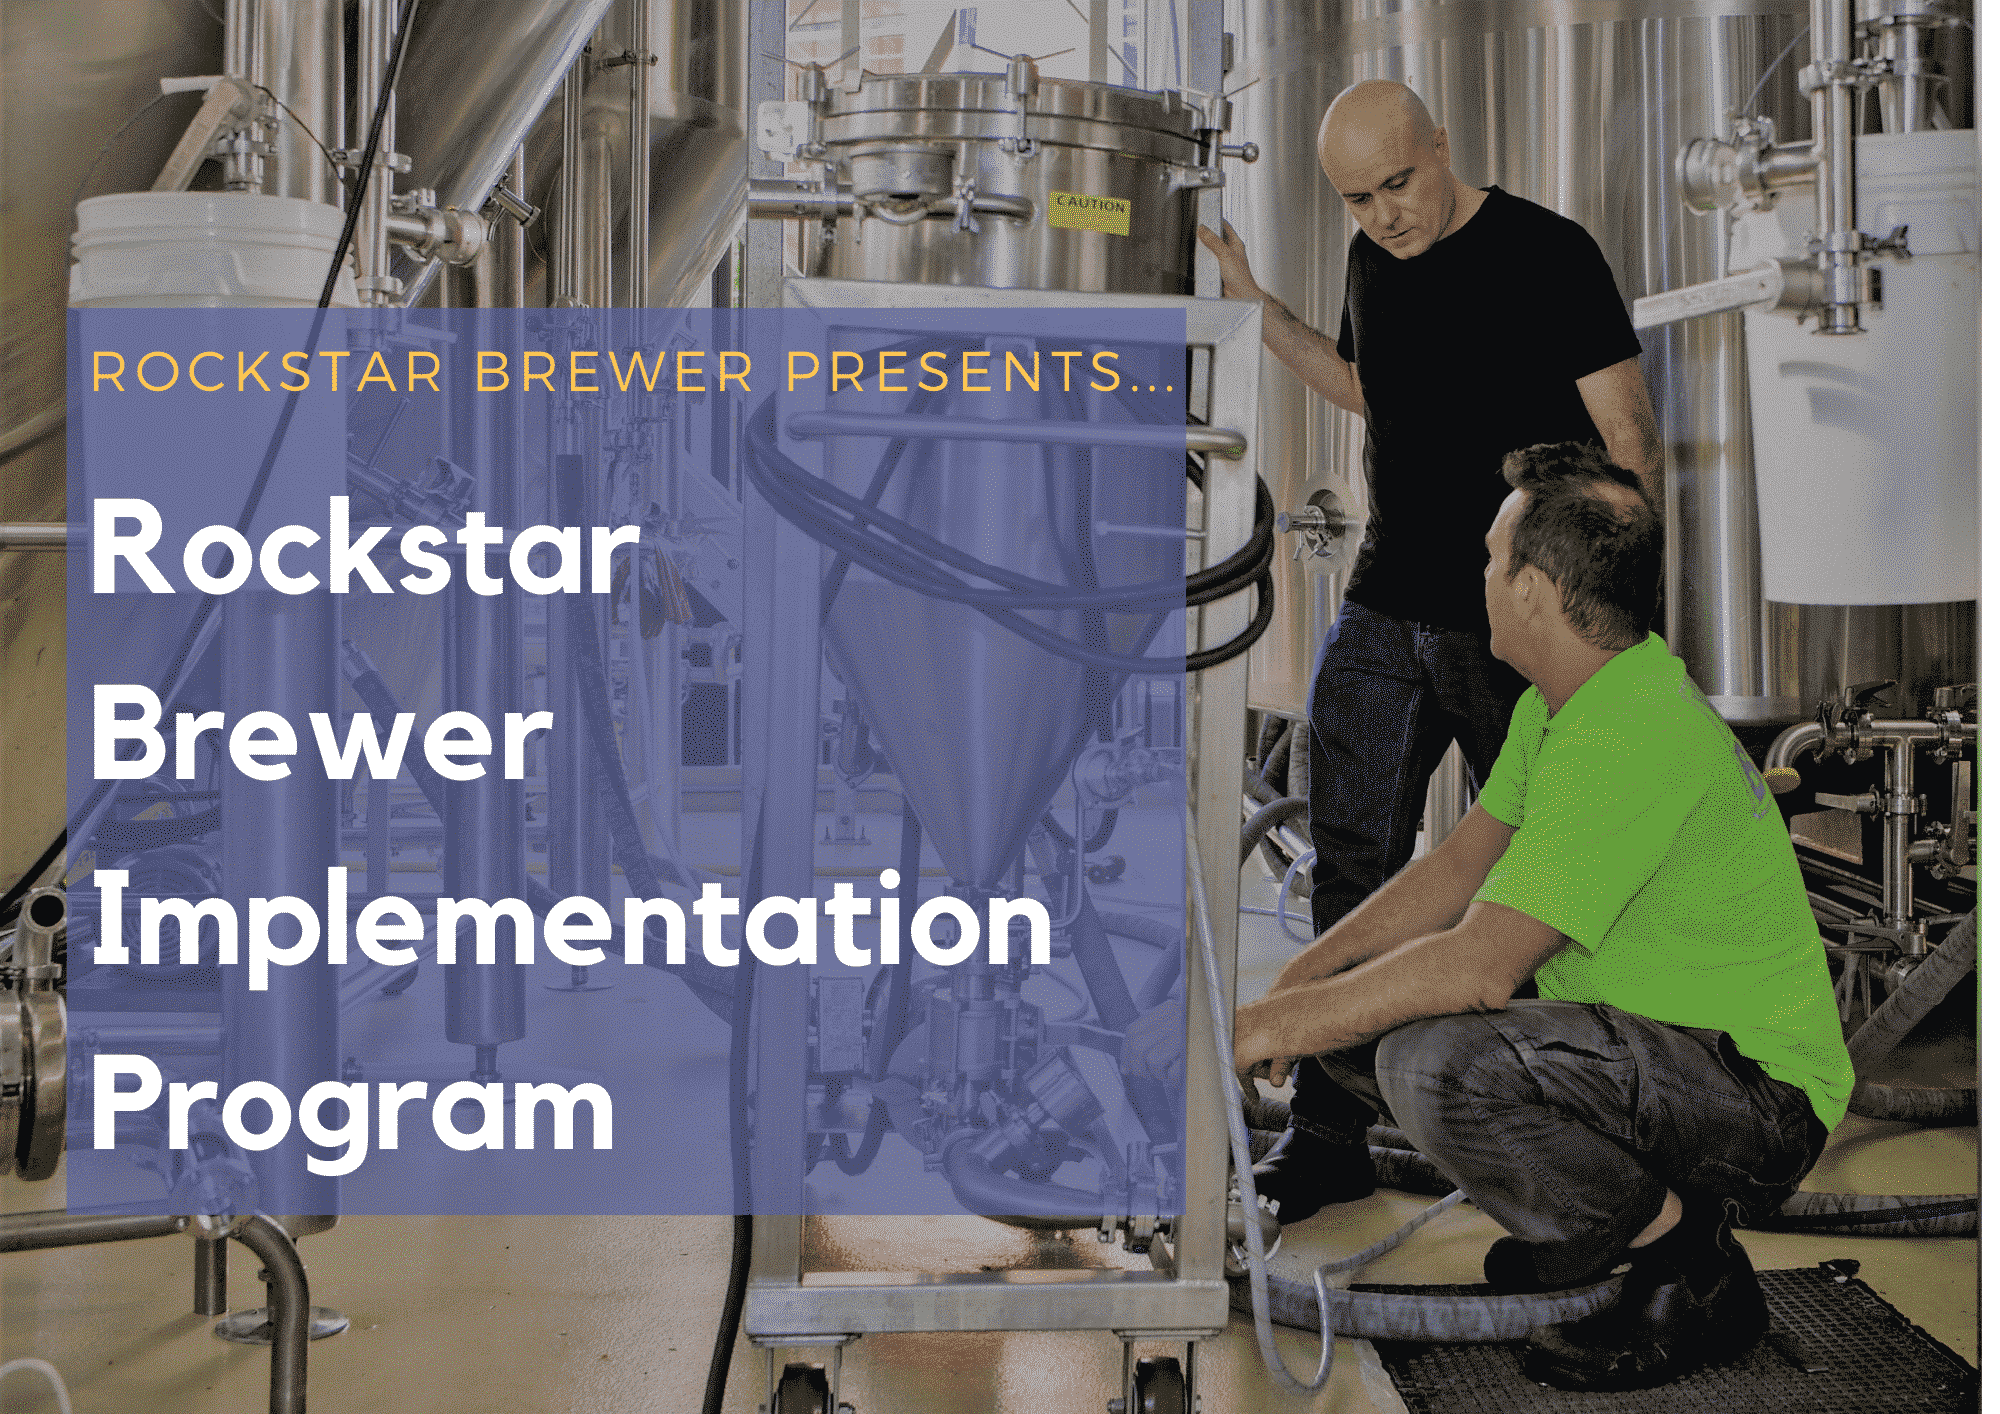 Rockstar Brewer Implementation Program